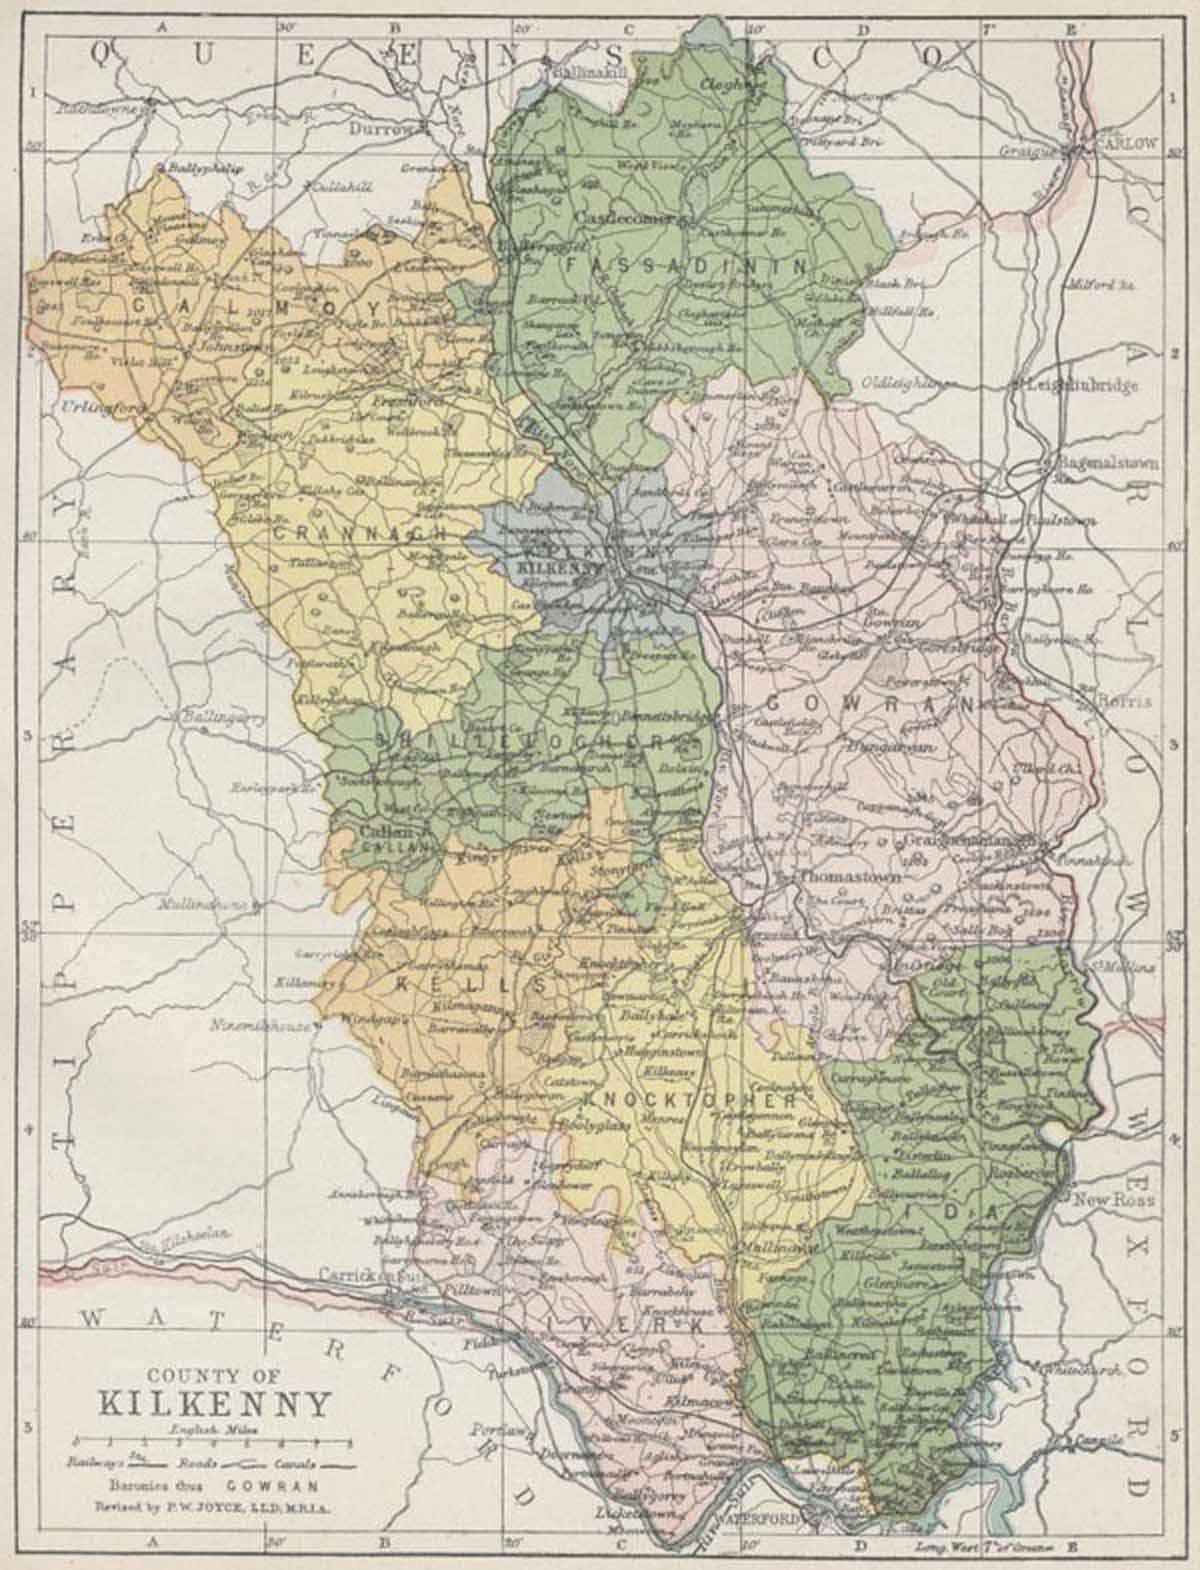 Maps Ireland Counties County Kilkenny Map